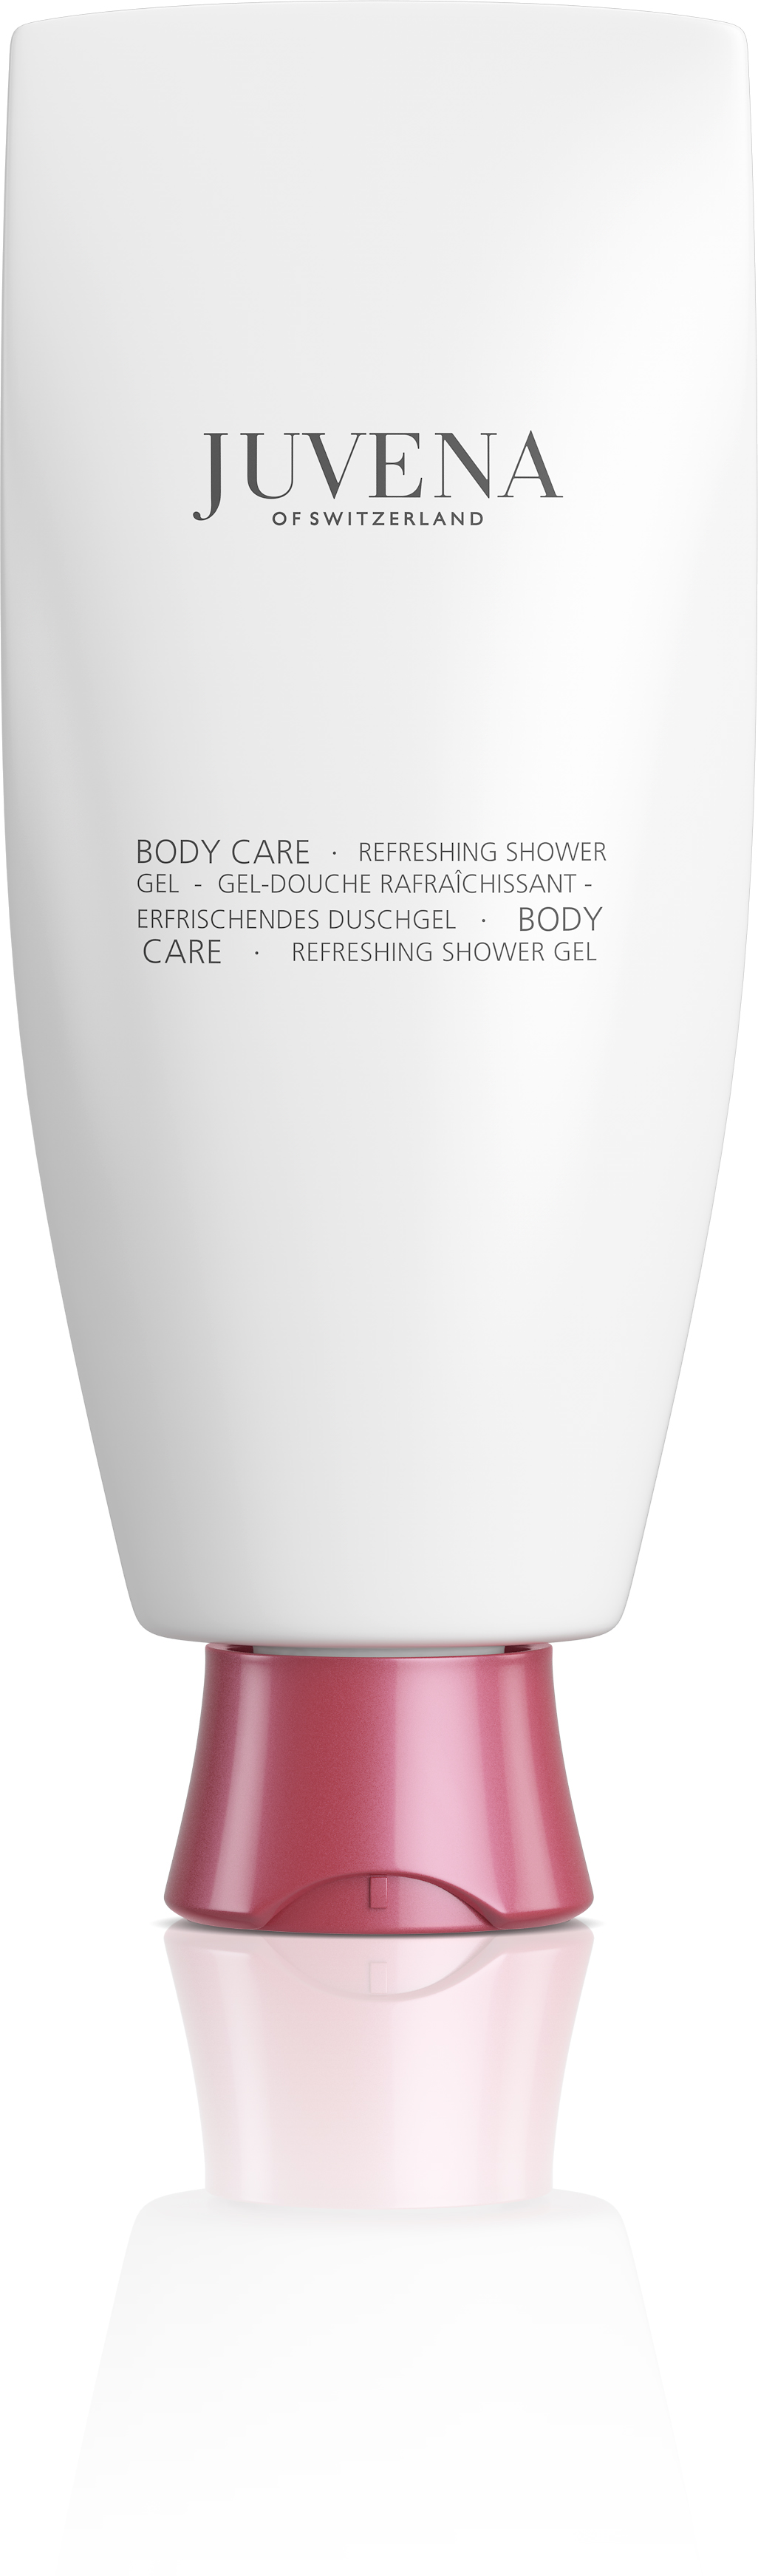 Juvena Body Daily Recreation Shower Gel 200 ml